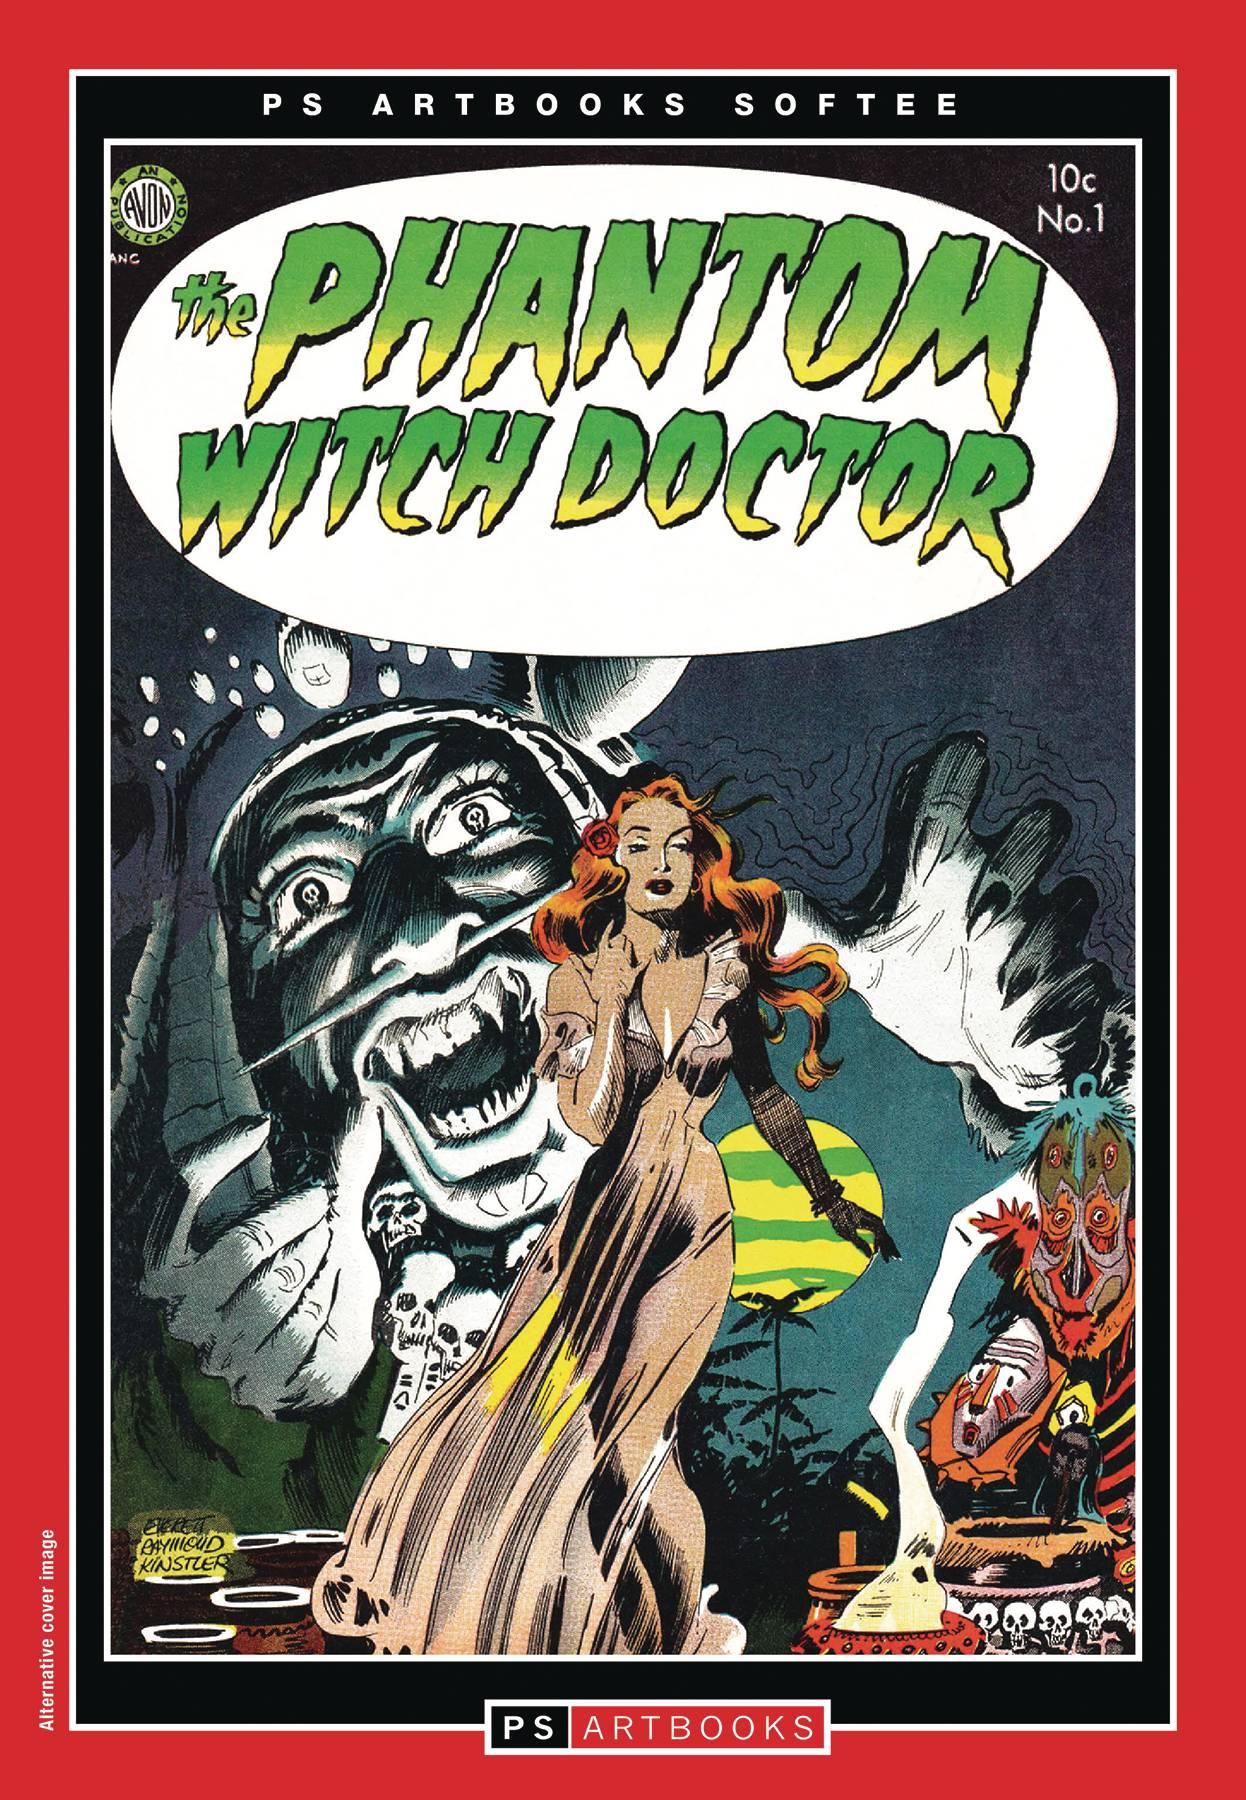 PS ARTBOOKS BEWARE SOFTEE TP 01 PHANTOM WITCH DOCTOR CVR